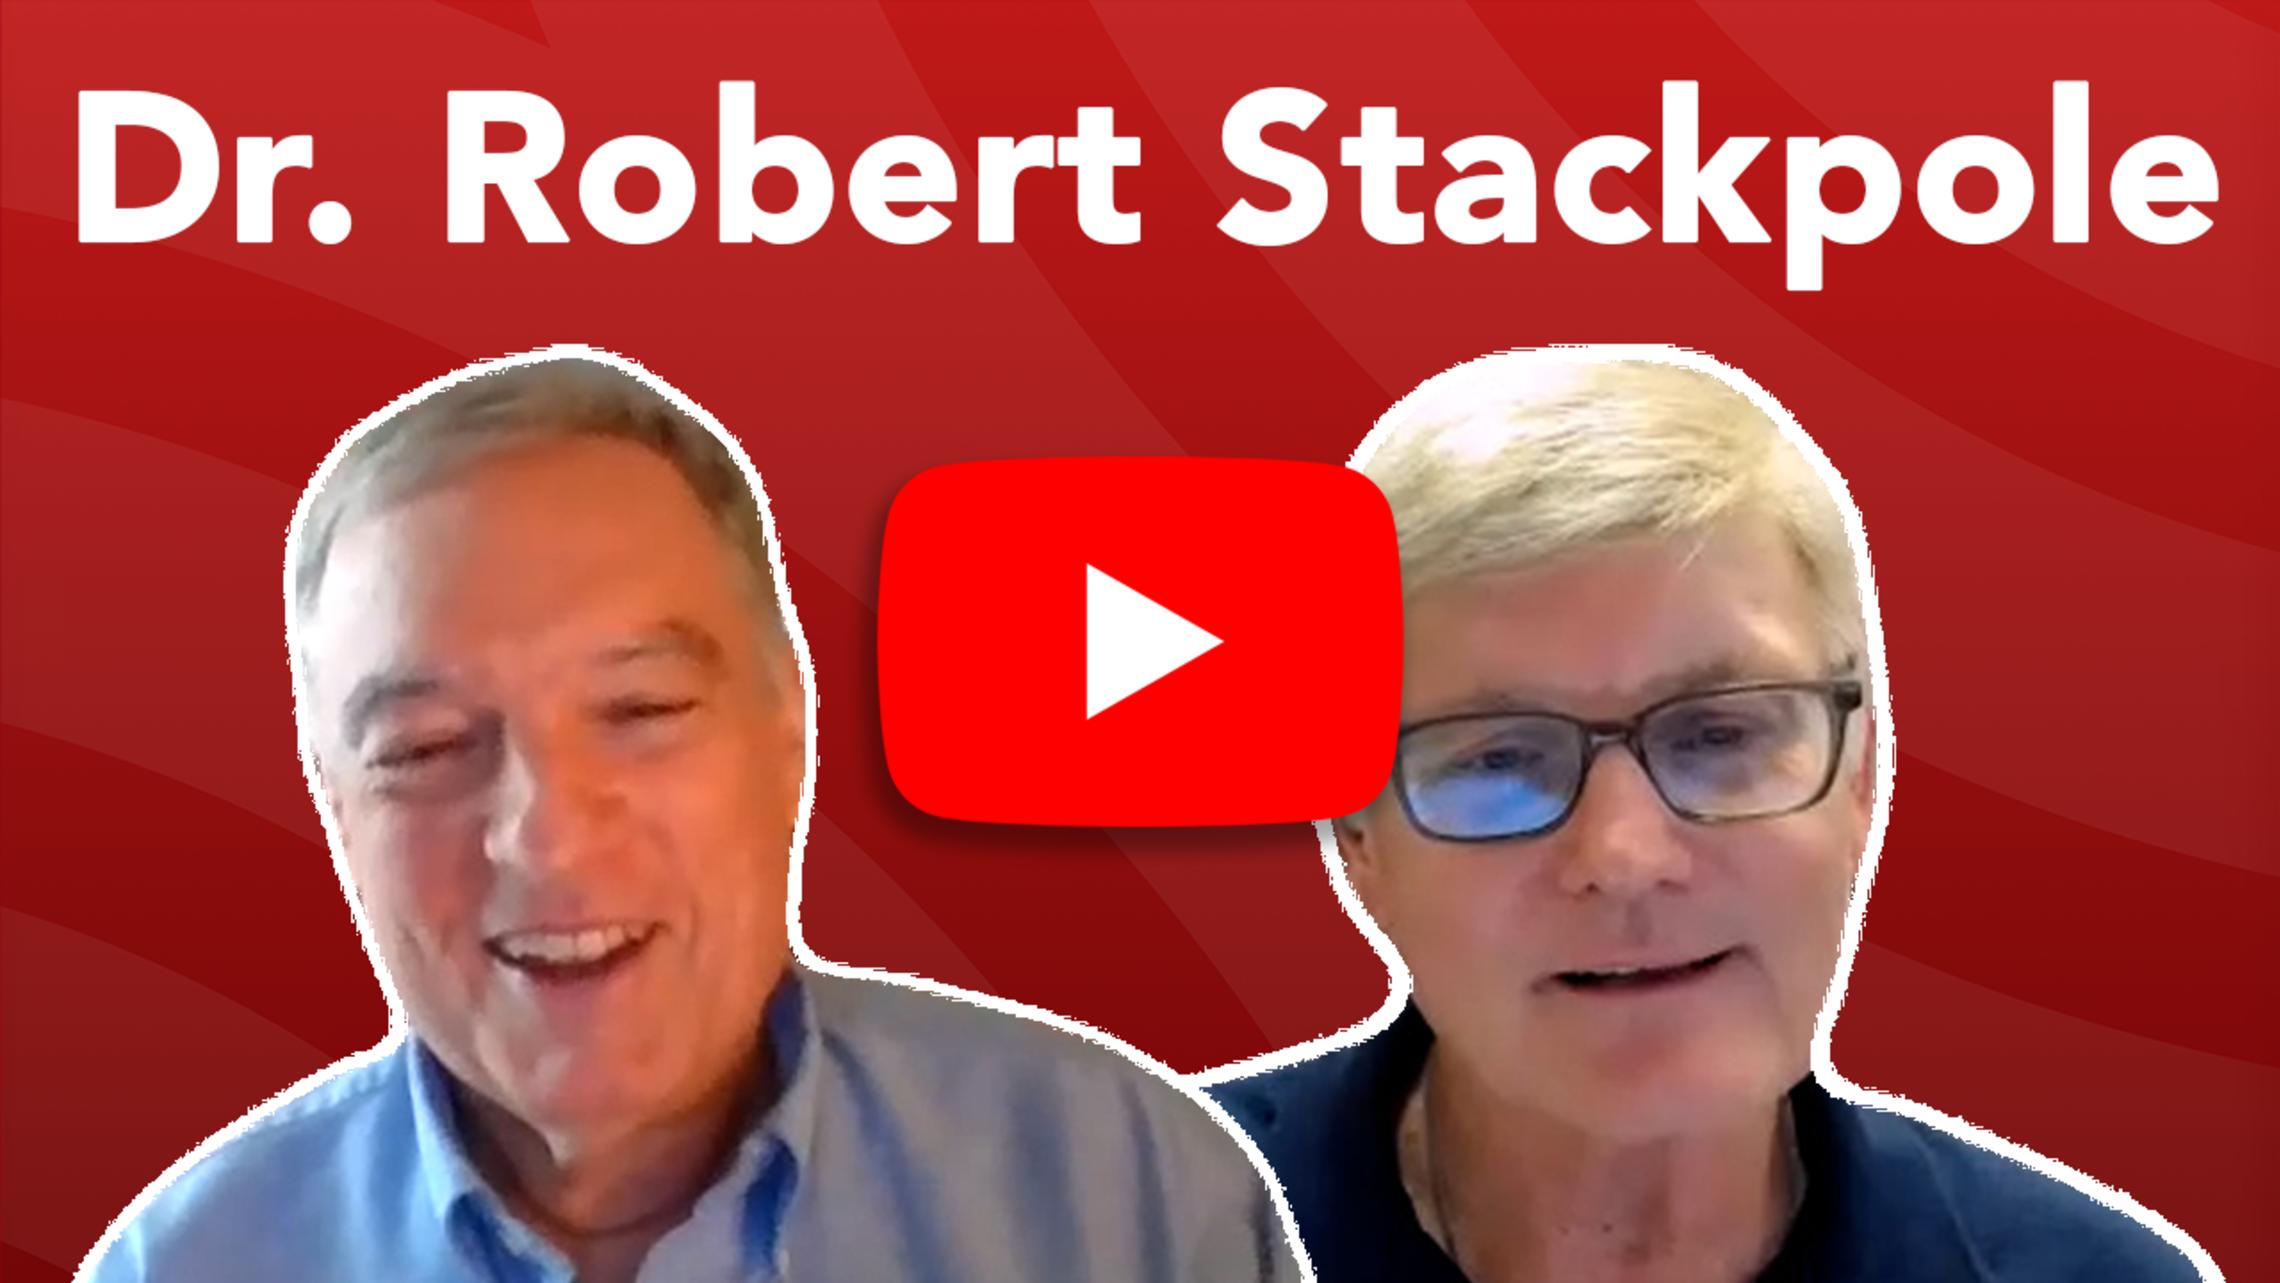 Dr. Robert Stackpole Tn Website